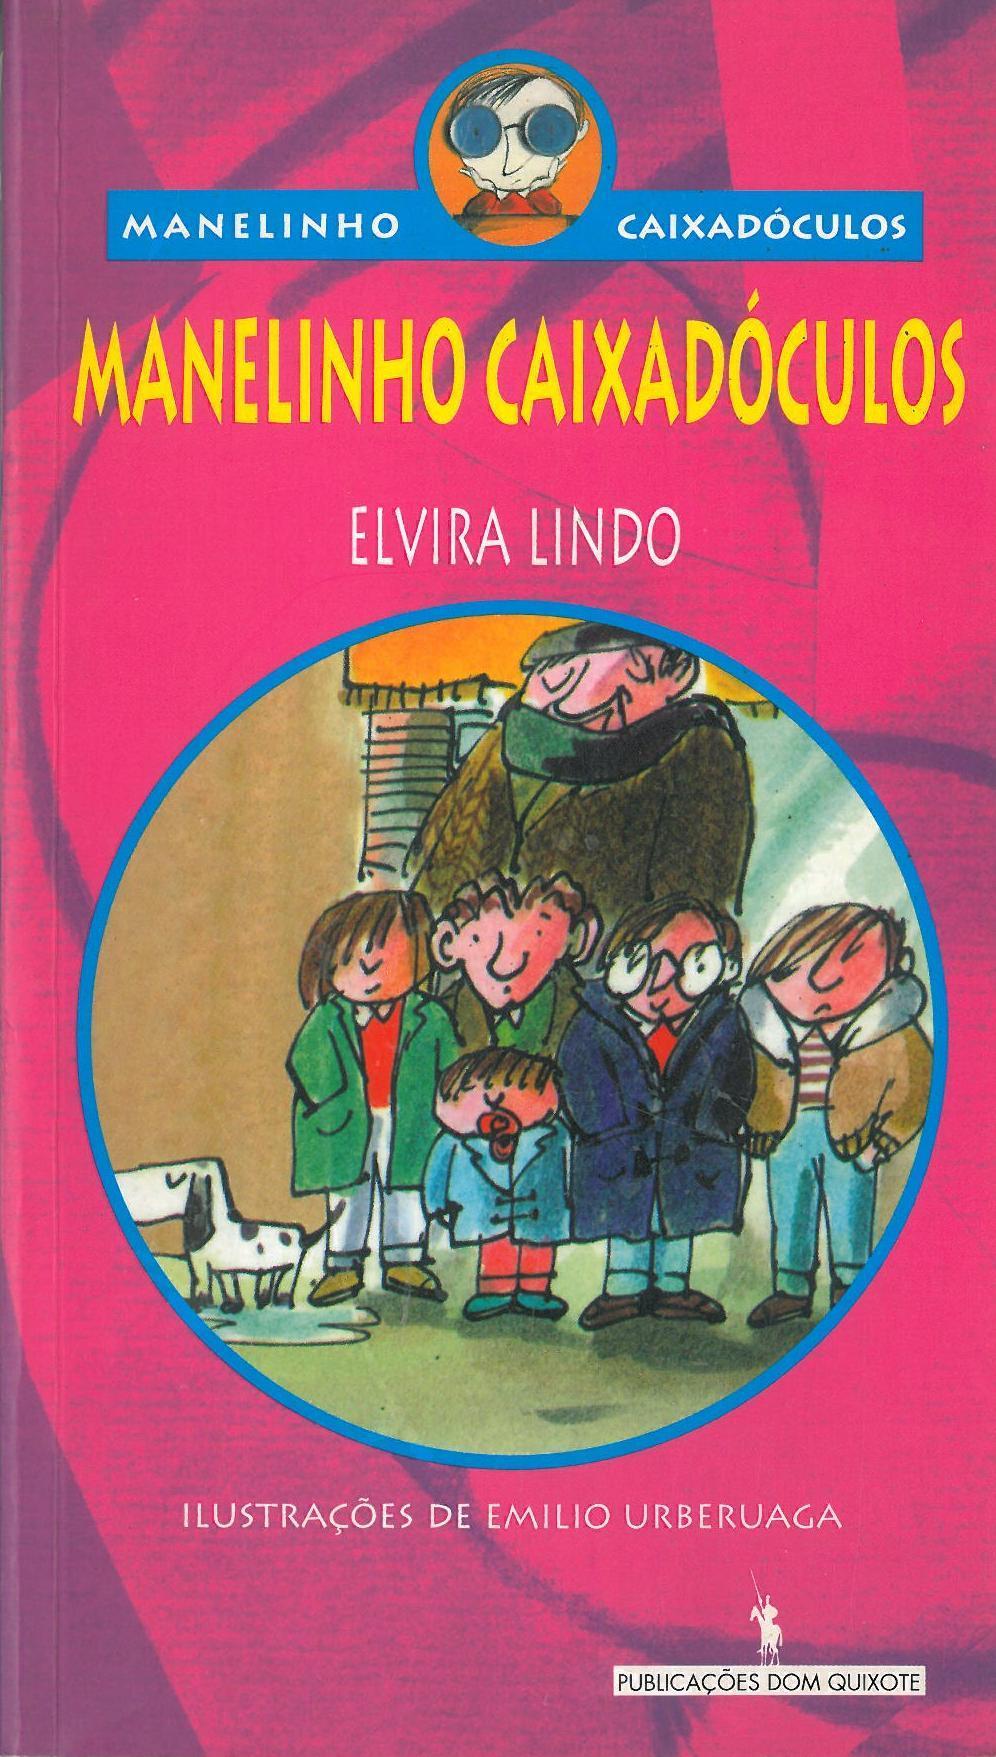 Manelinho Caixadóculos_.jpg